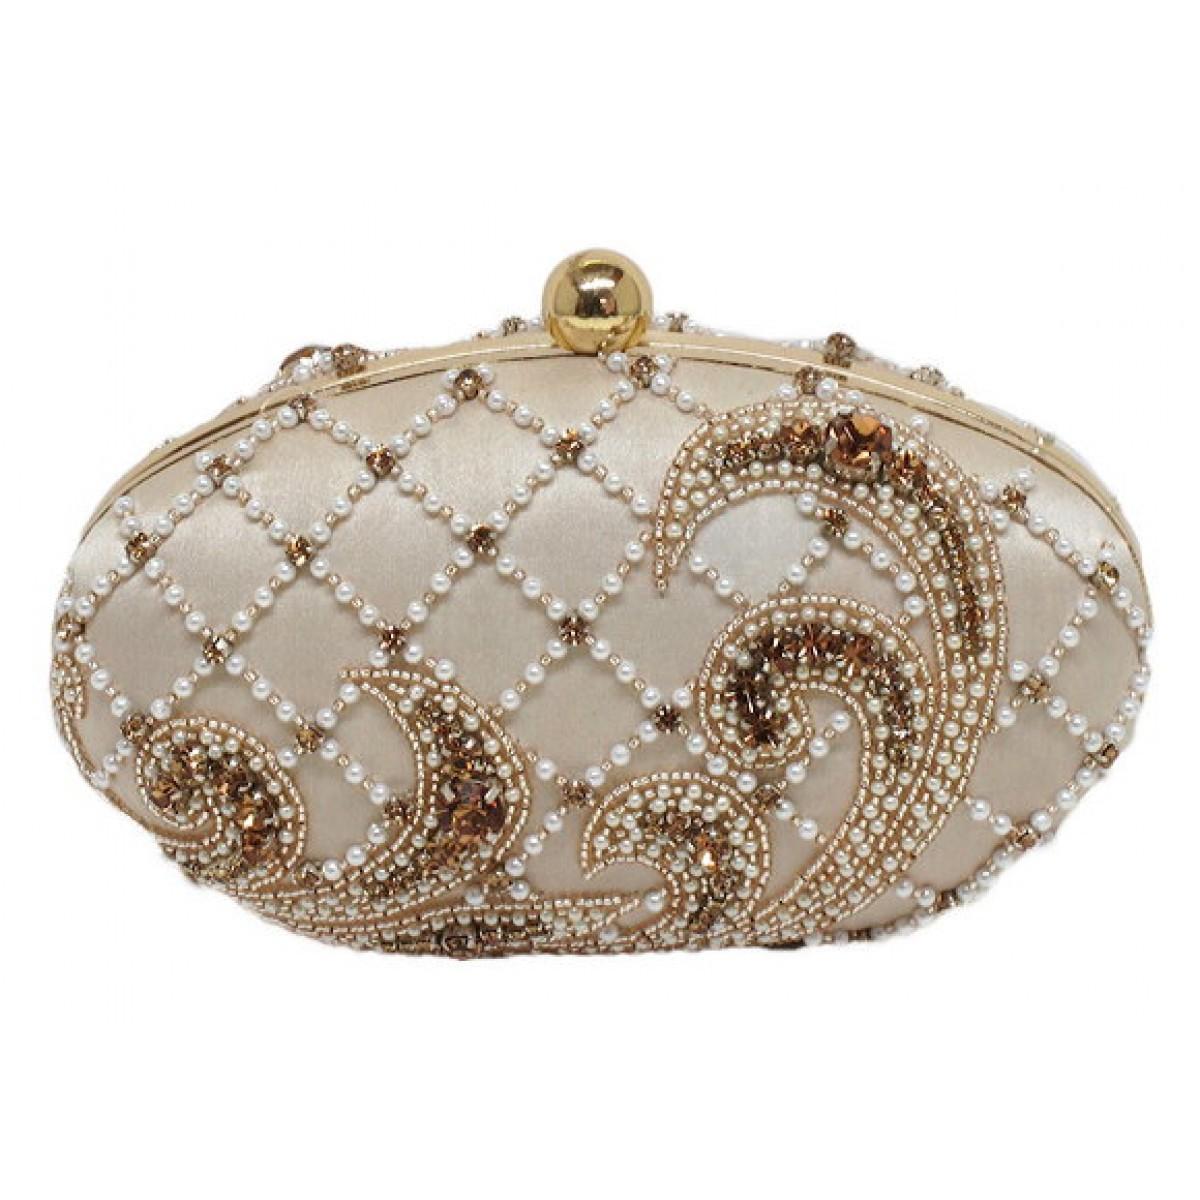 Oval Box Bag with Pearl and Crystal Embelishments